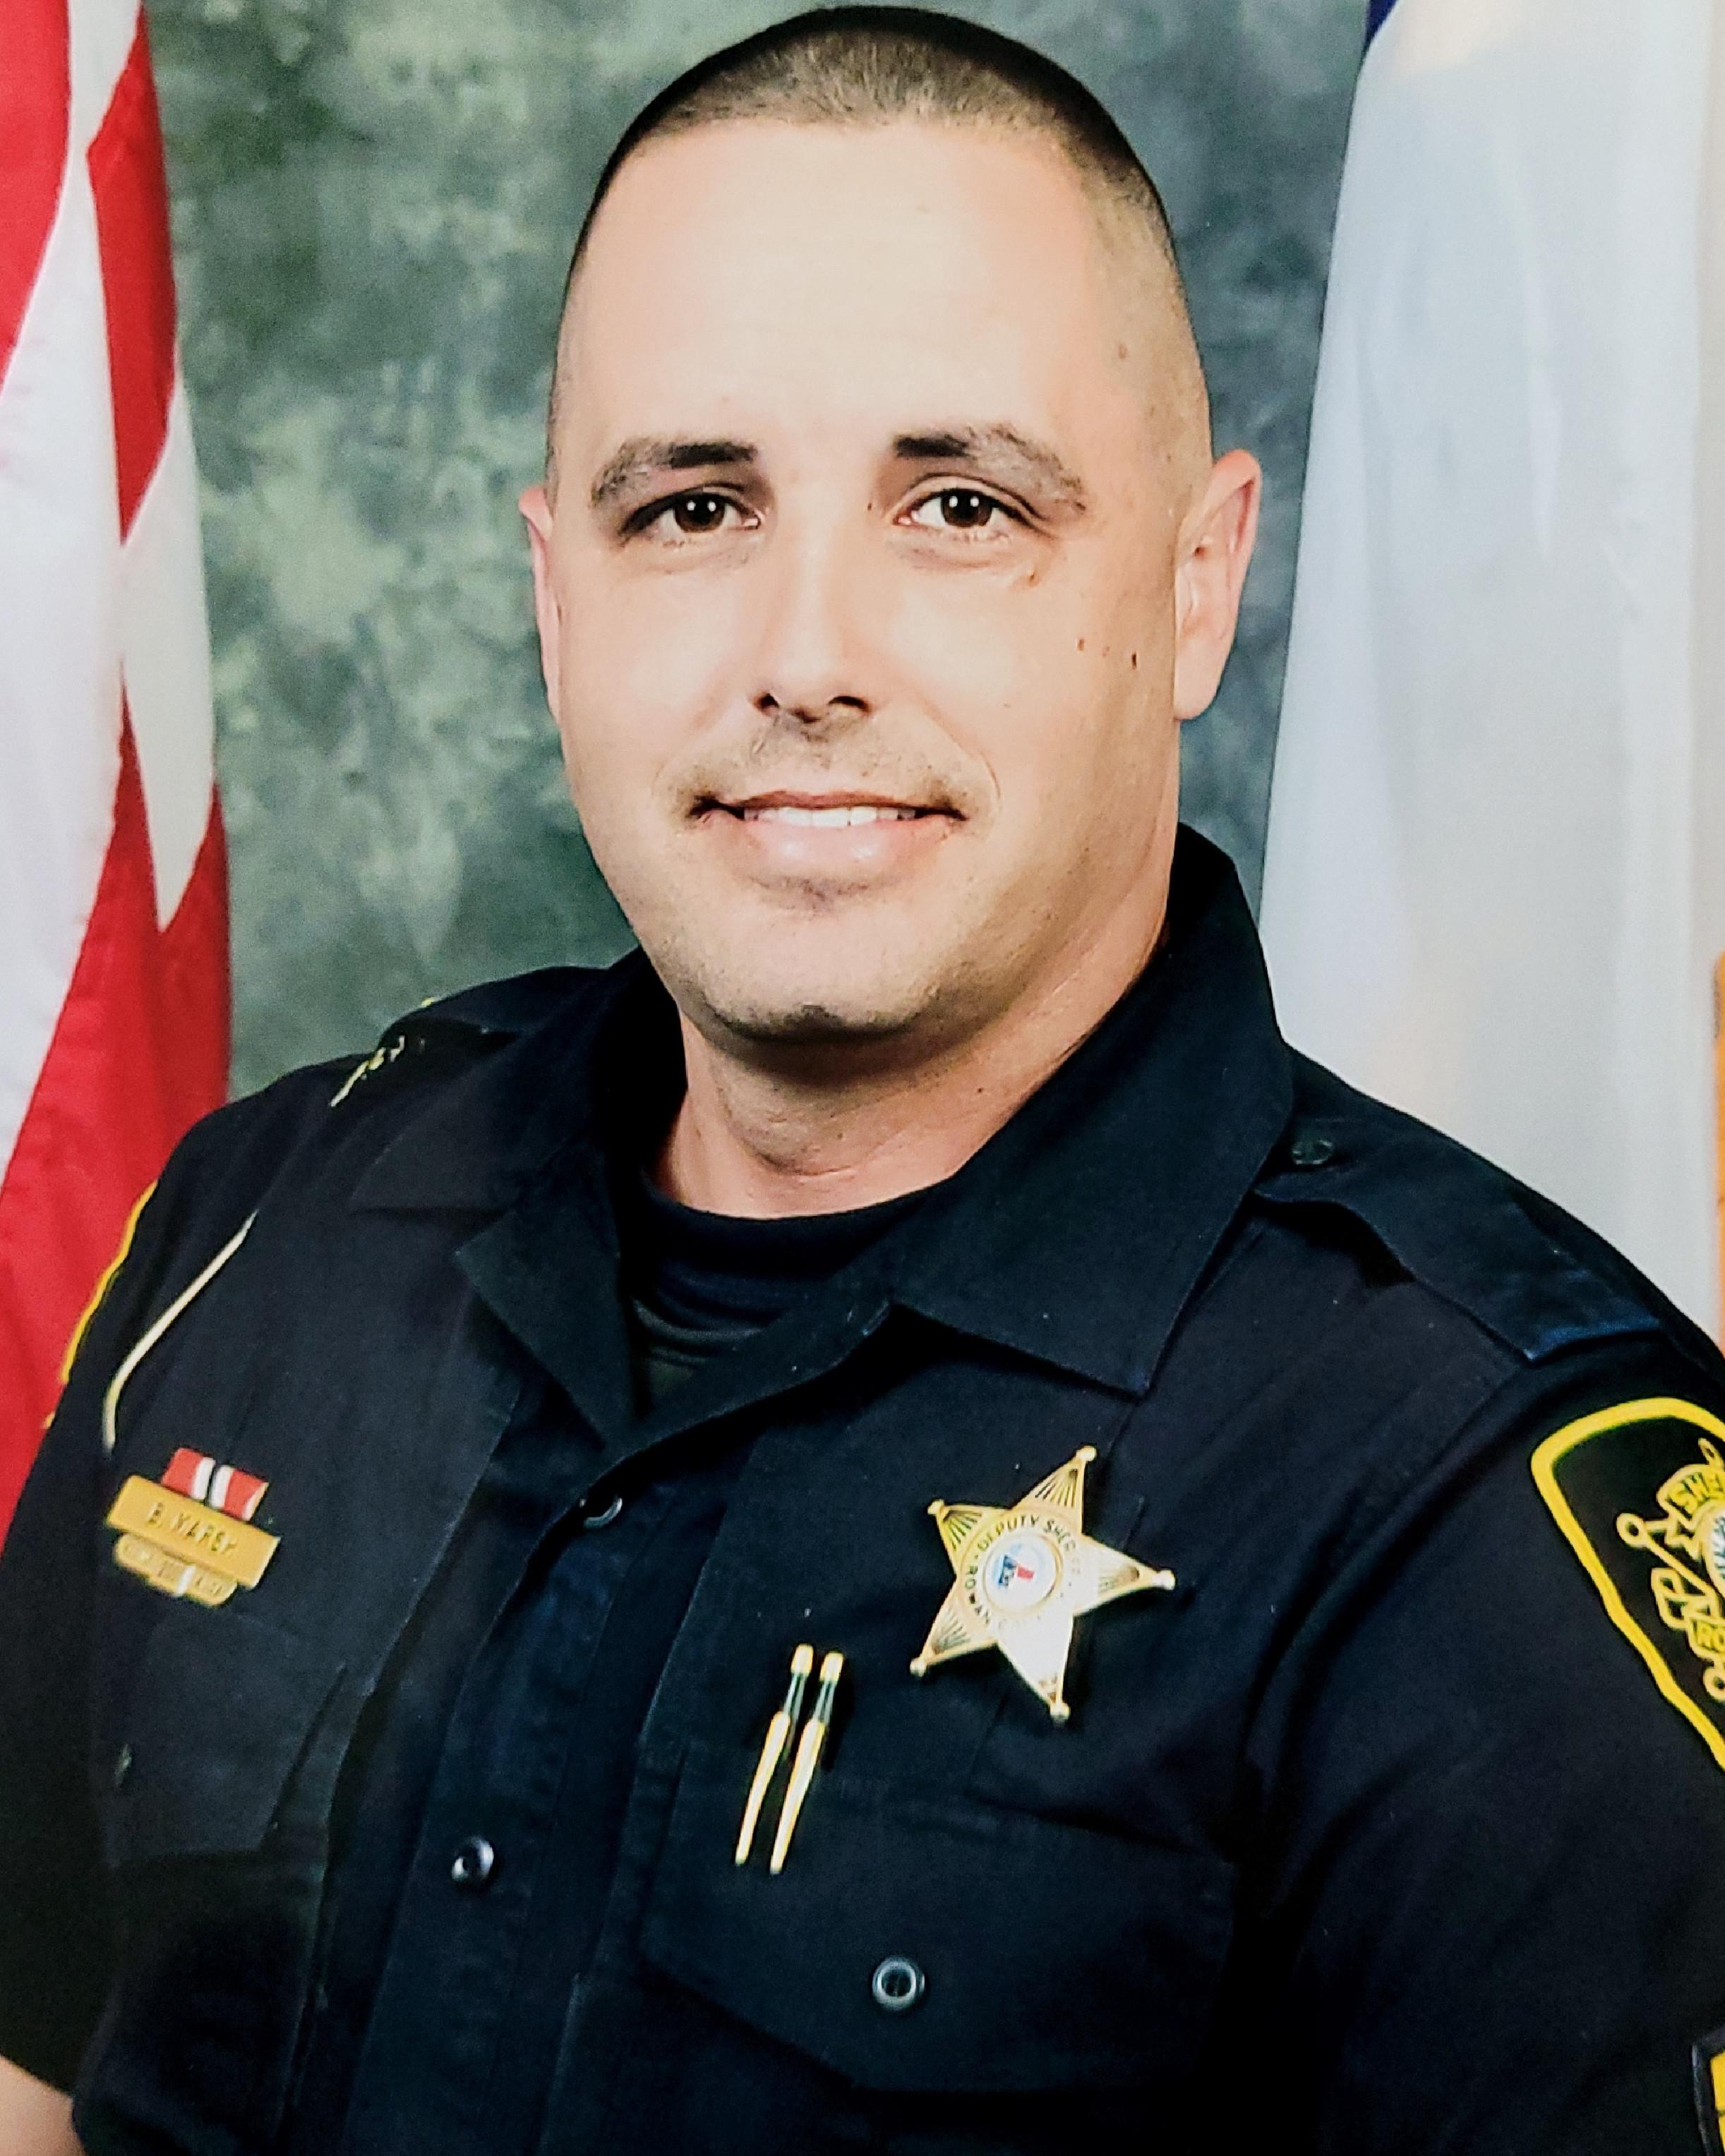 Master Deputy William Edward Marsh | Rowan County Sheriff's Office, North Carolina